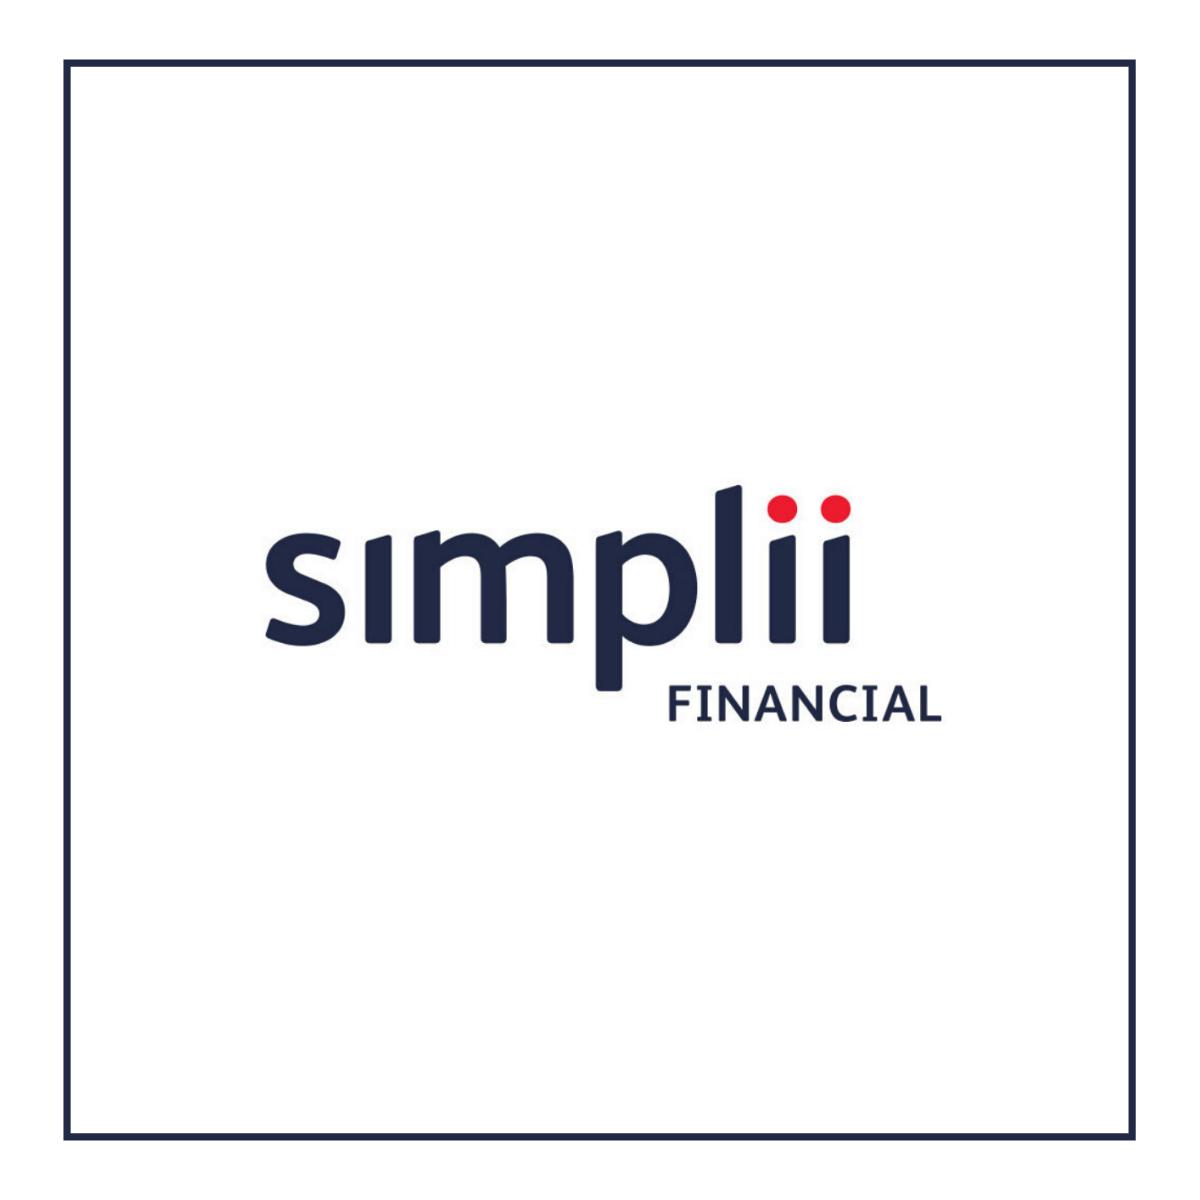 Simplii Financial Review